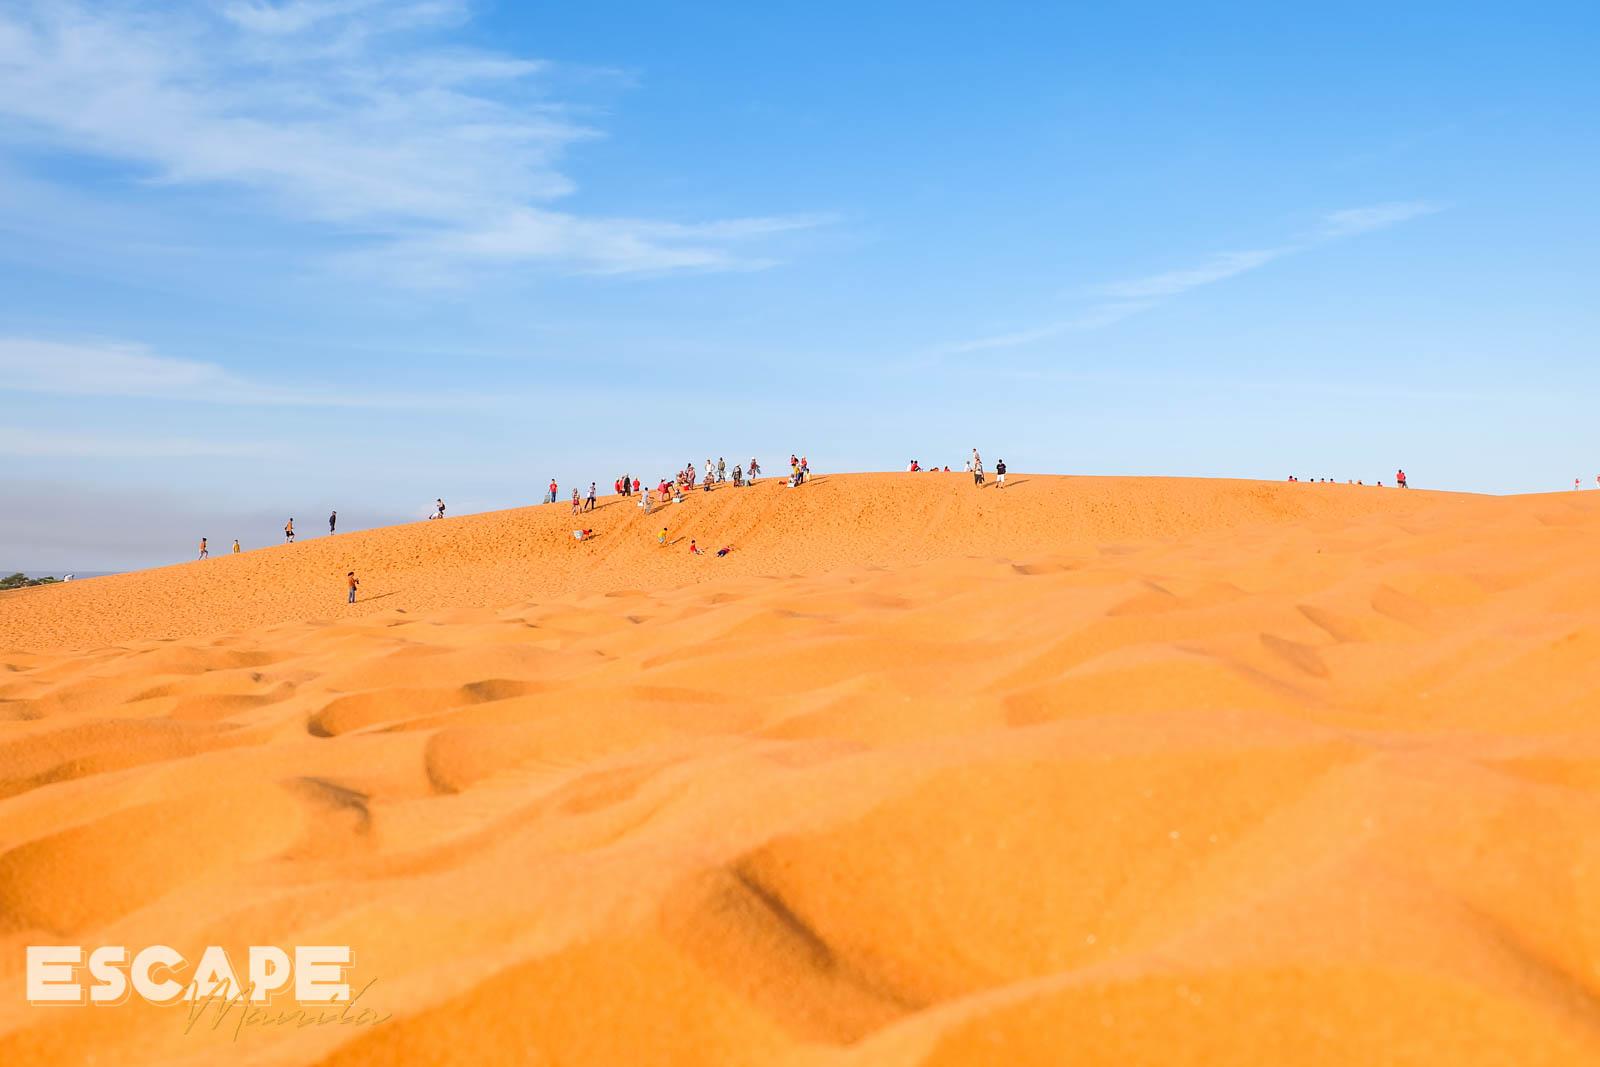 Mui Ne + Phan Thiet Travel Guide Blog: Things To Do, Tourist Spots & Itinerary